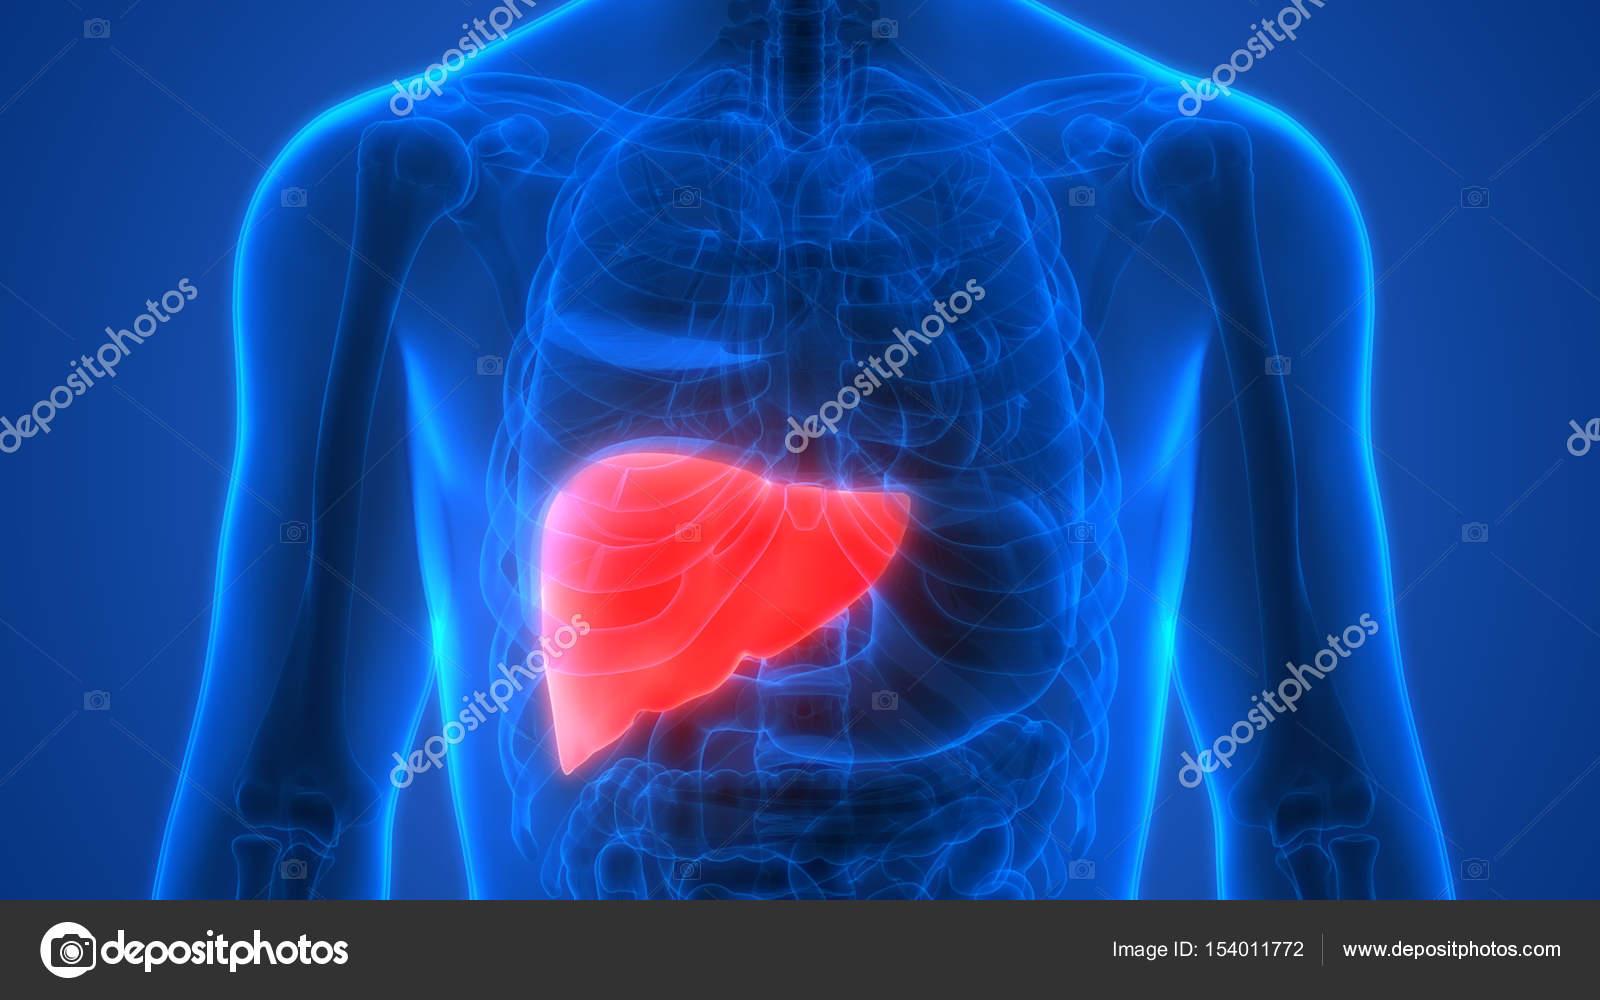 Human Body Organs Anatomy Liver Stockfoto Magicmine 154011772